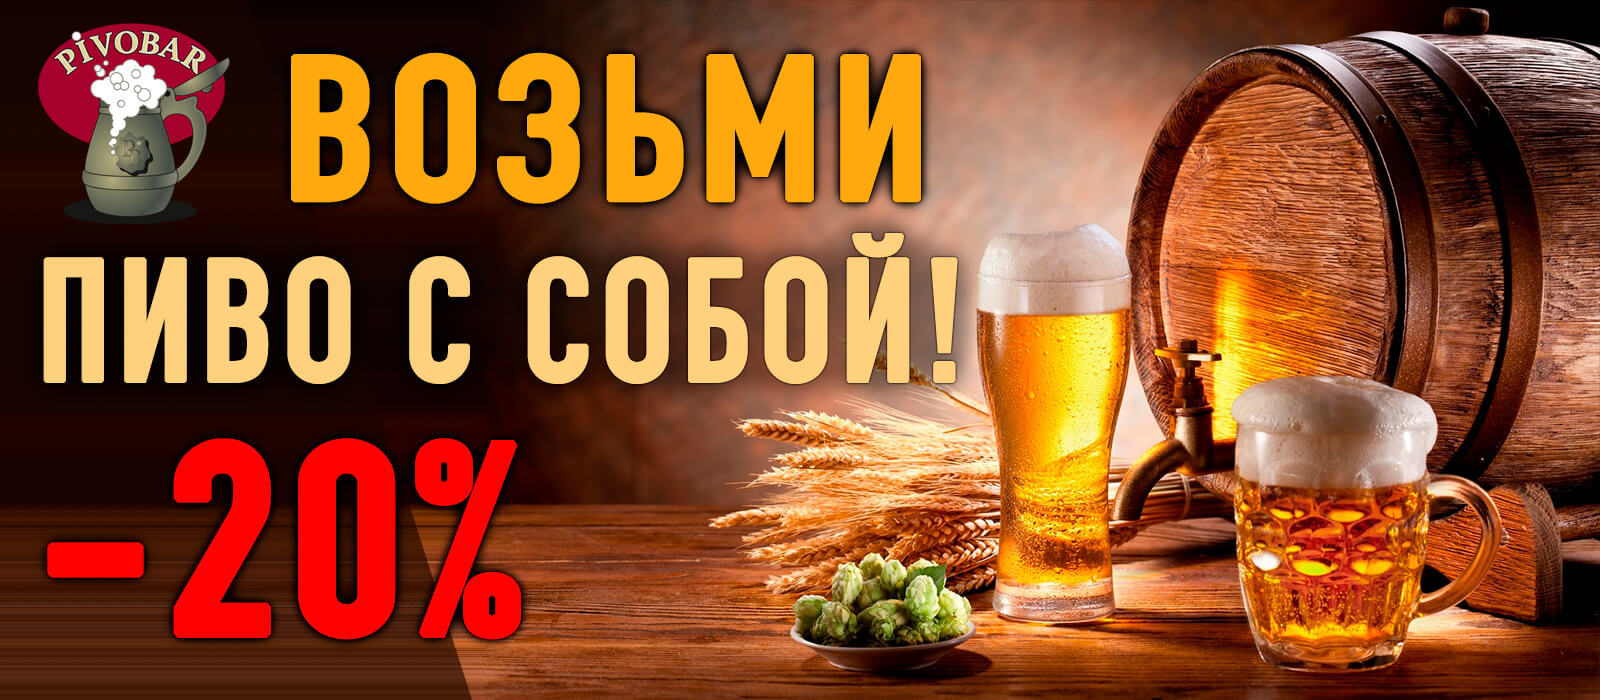 Скидка на пиво -20%